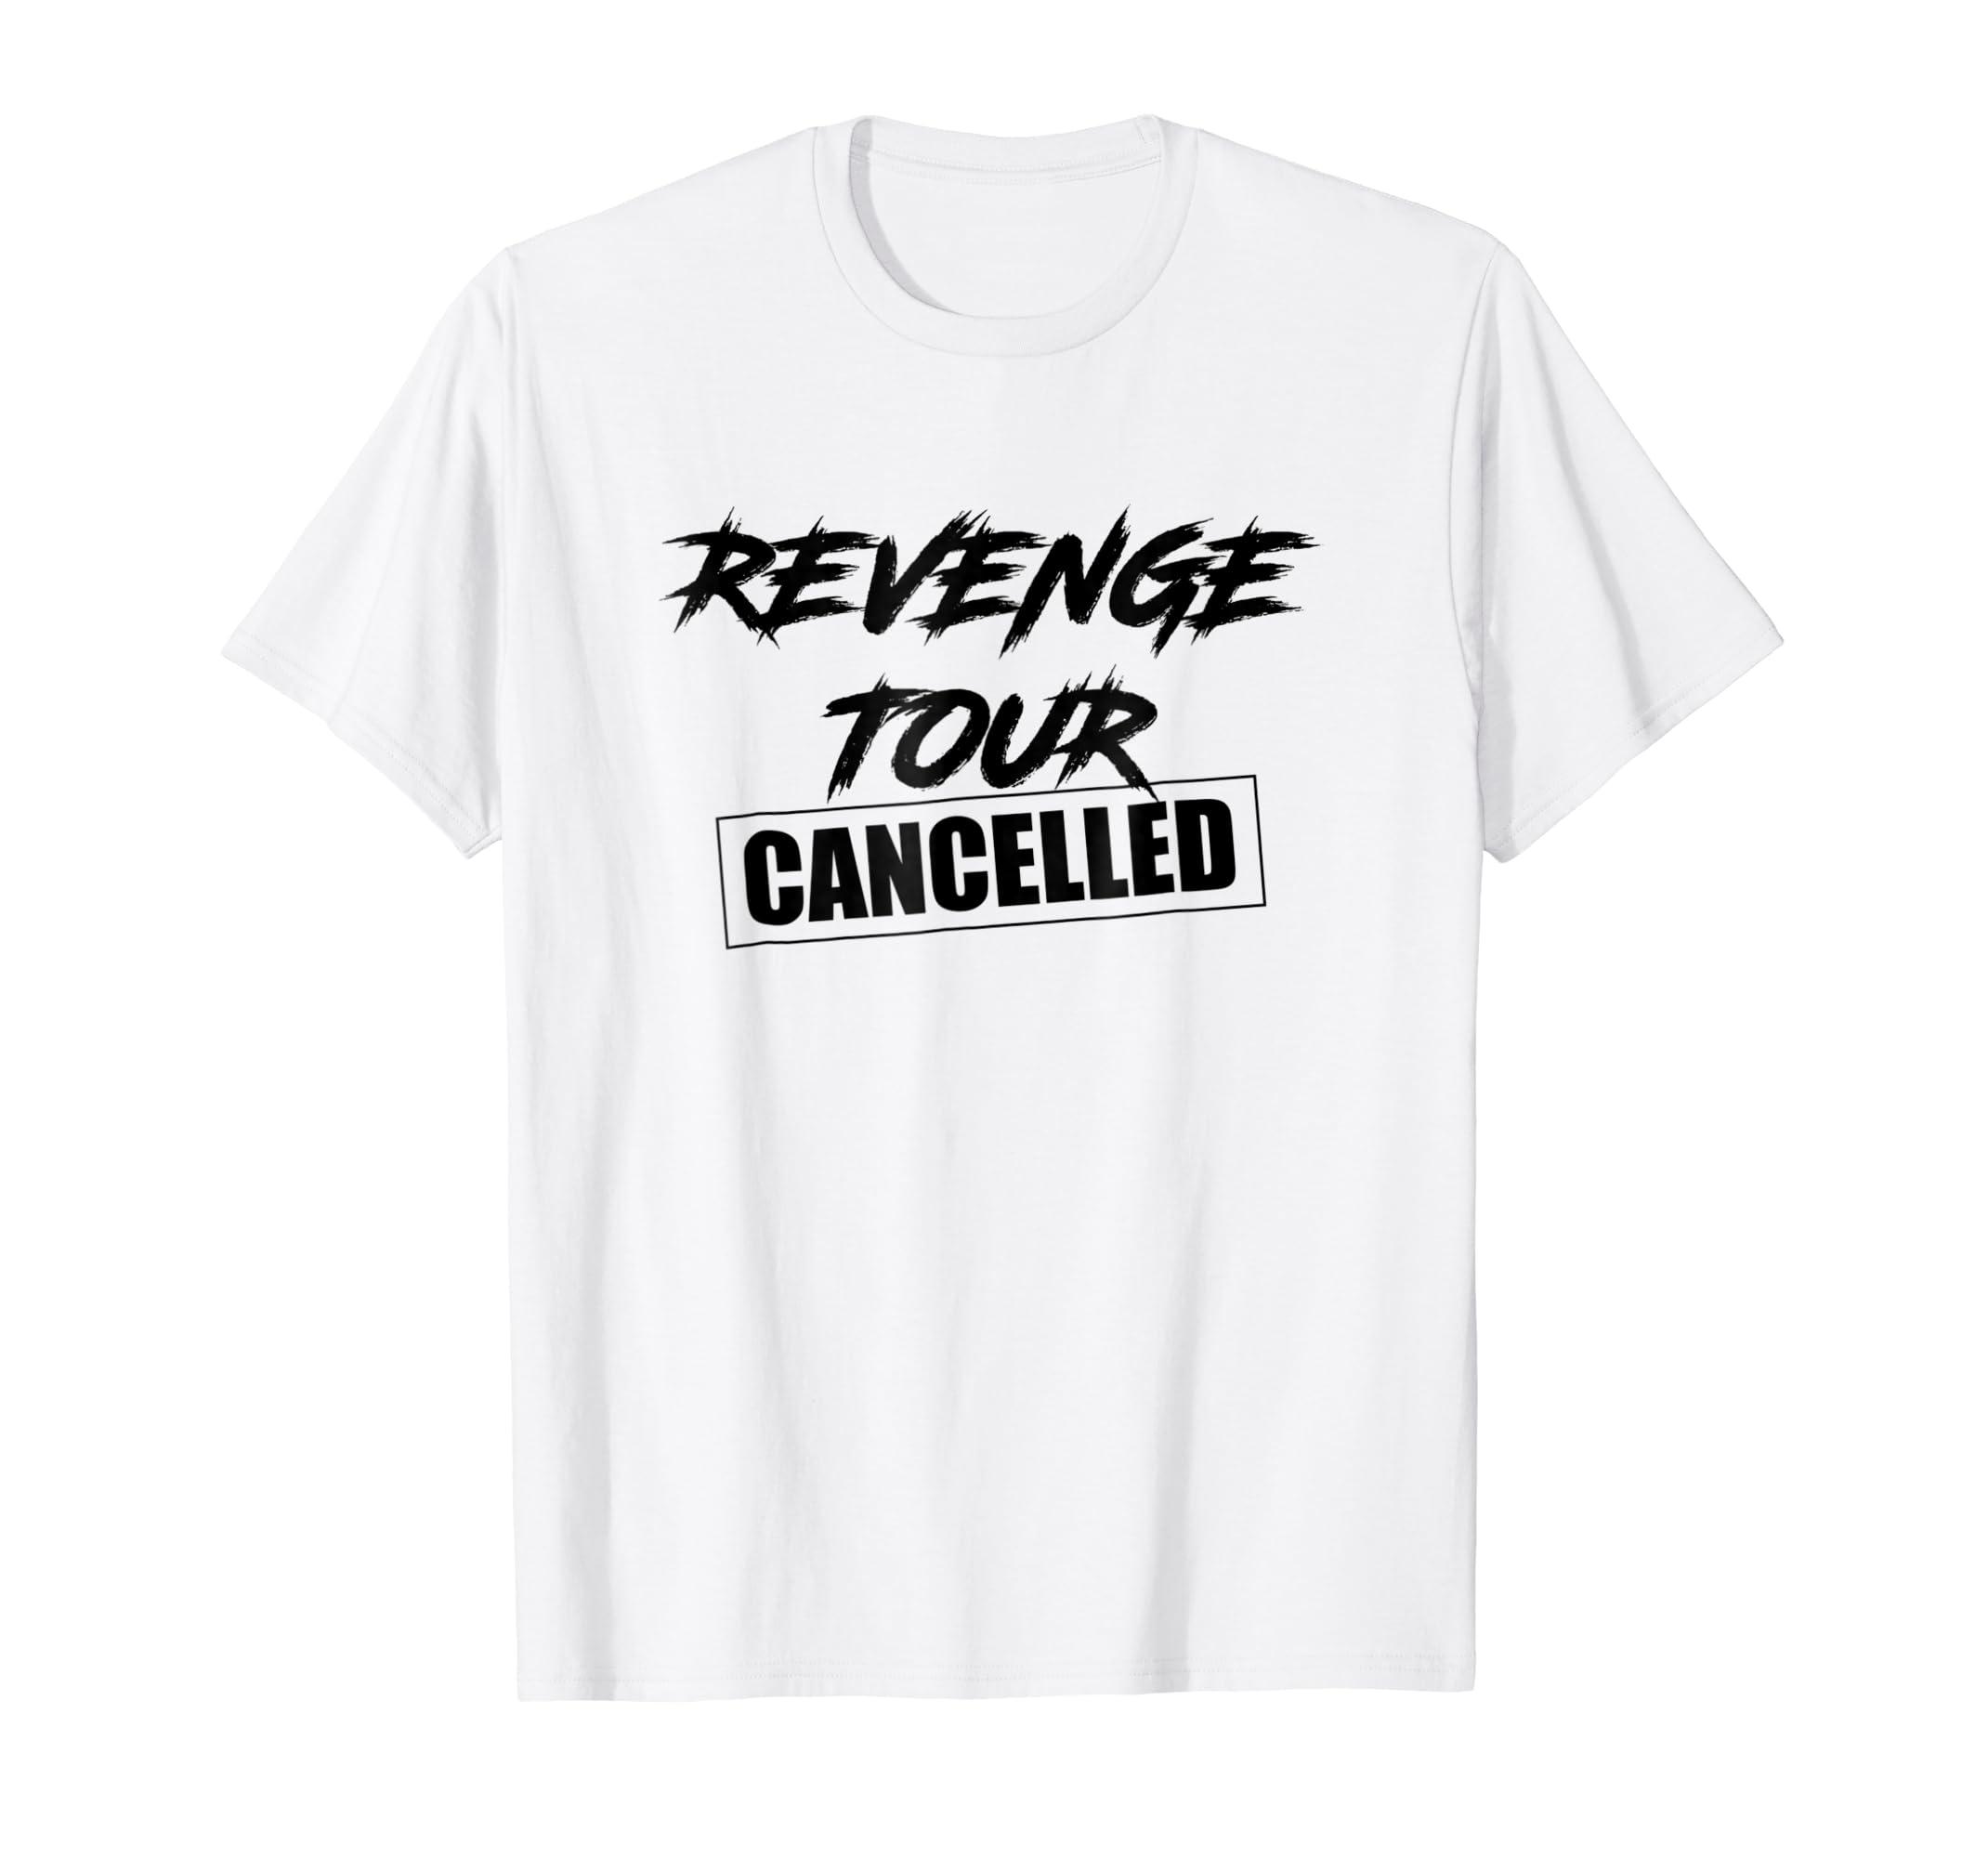 62db4c07 Revenge Tour Cancelled T-Shirt Hoodie Sweatshirt - Depotees